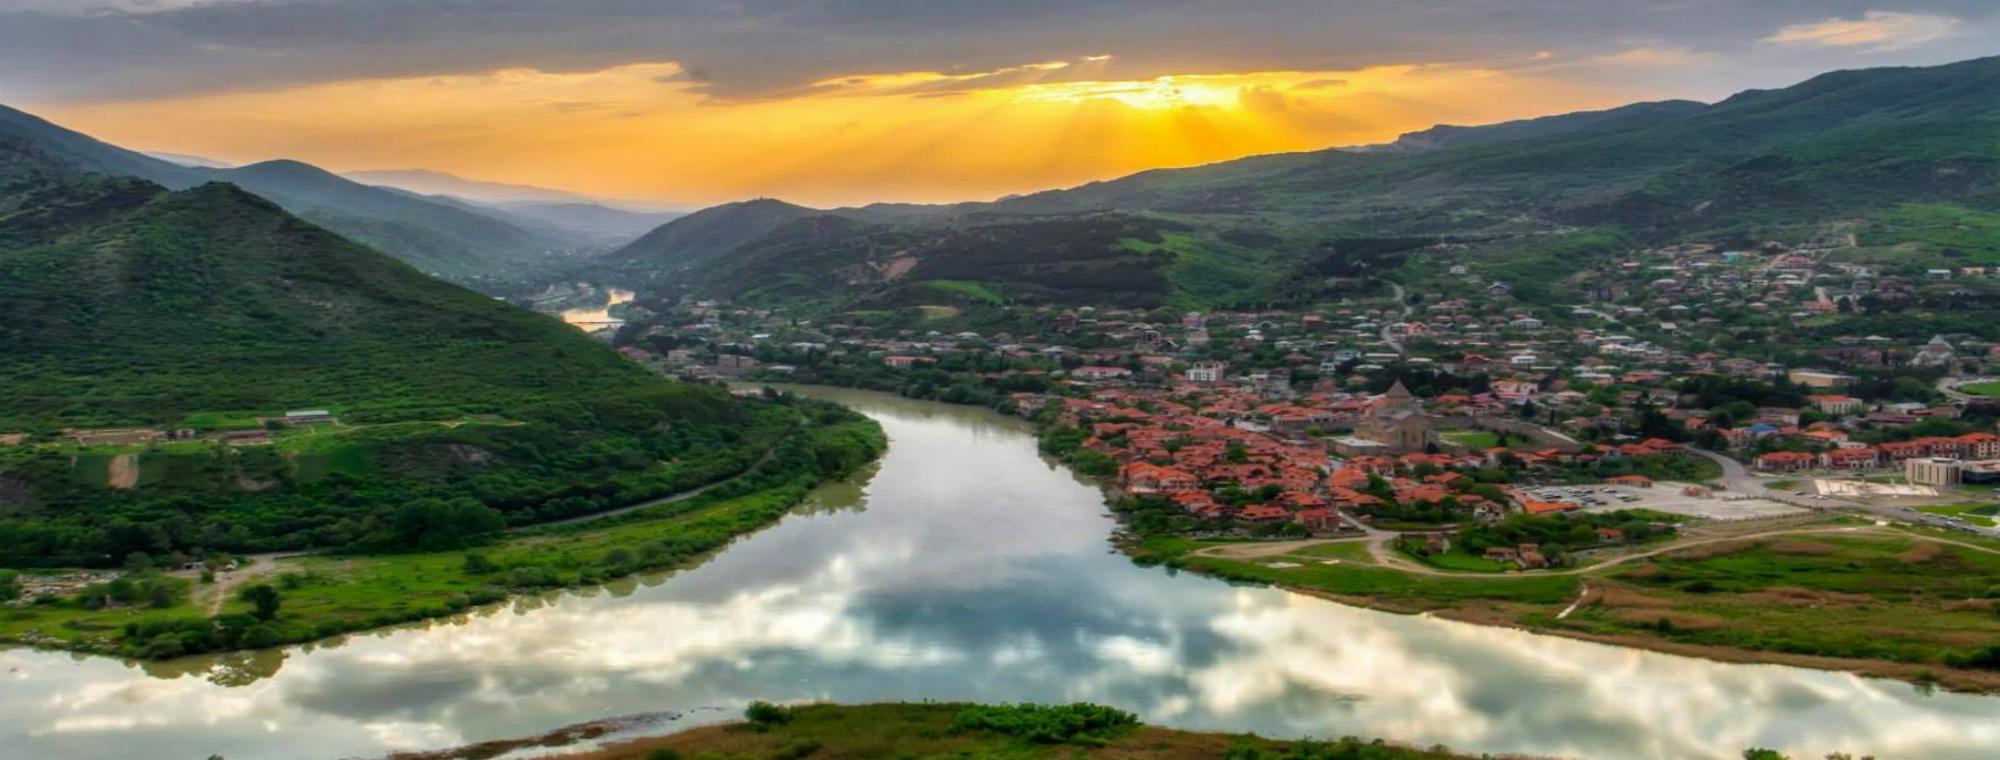 Tbilisi – Mtskheta